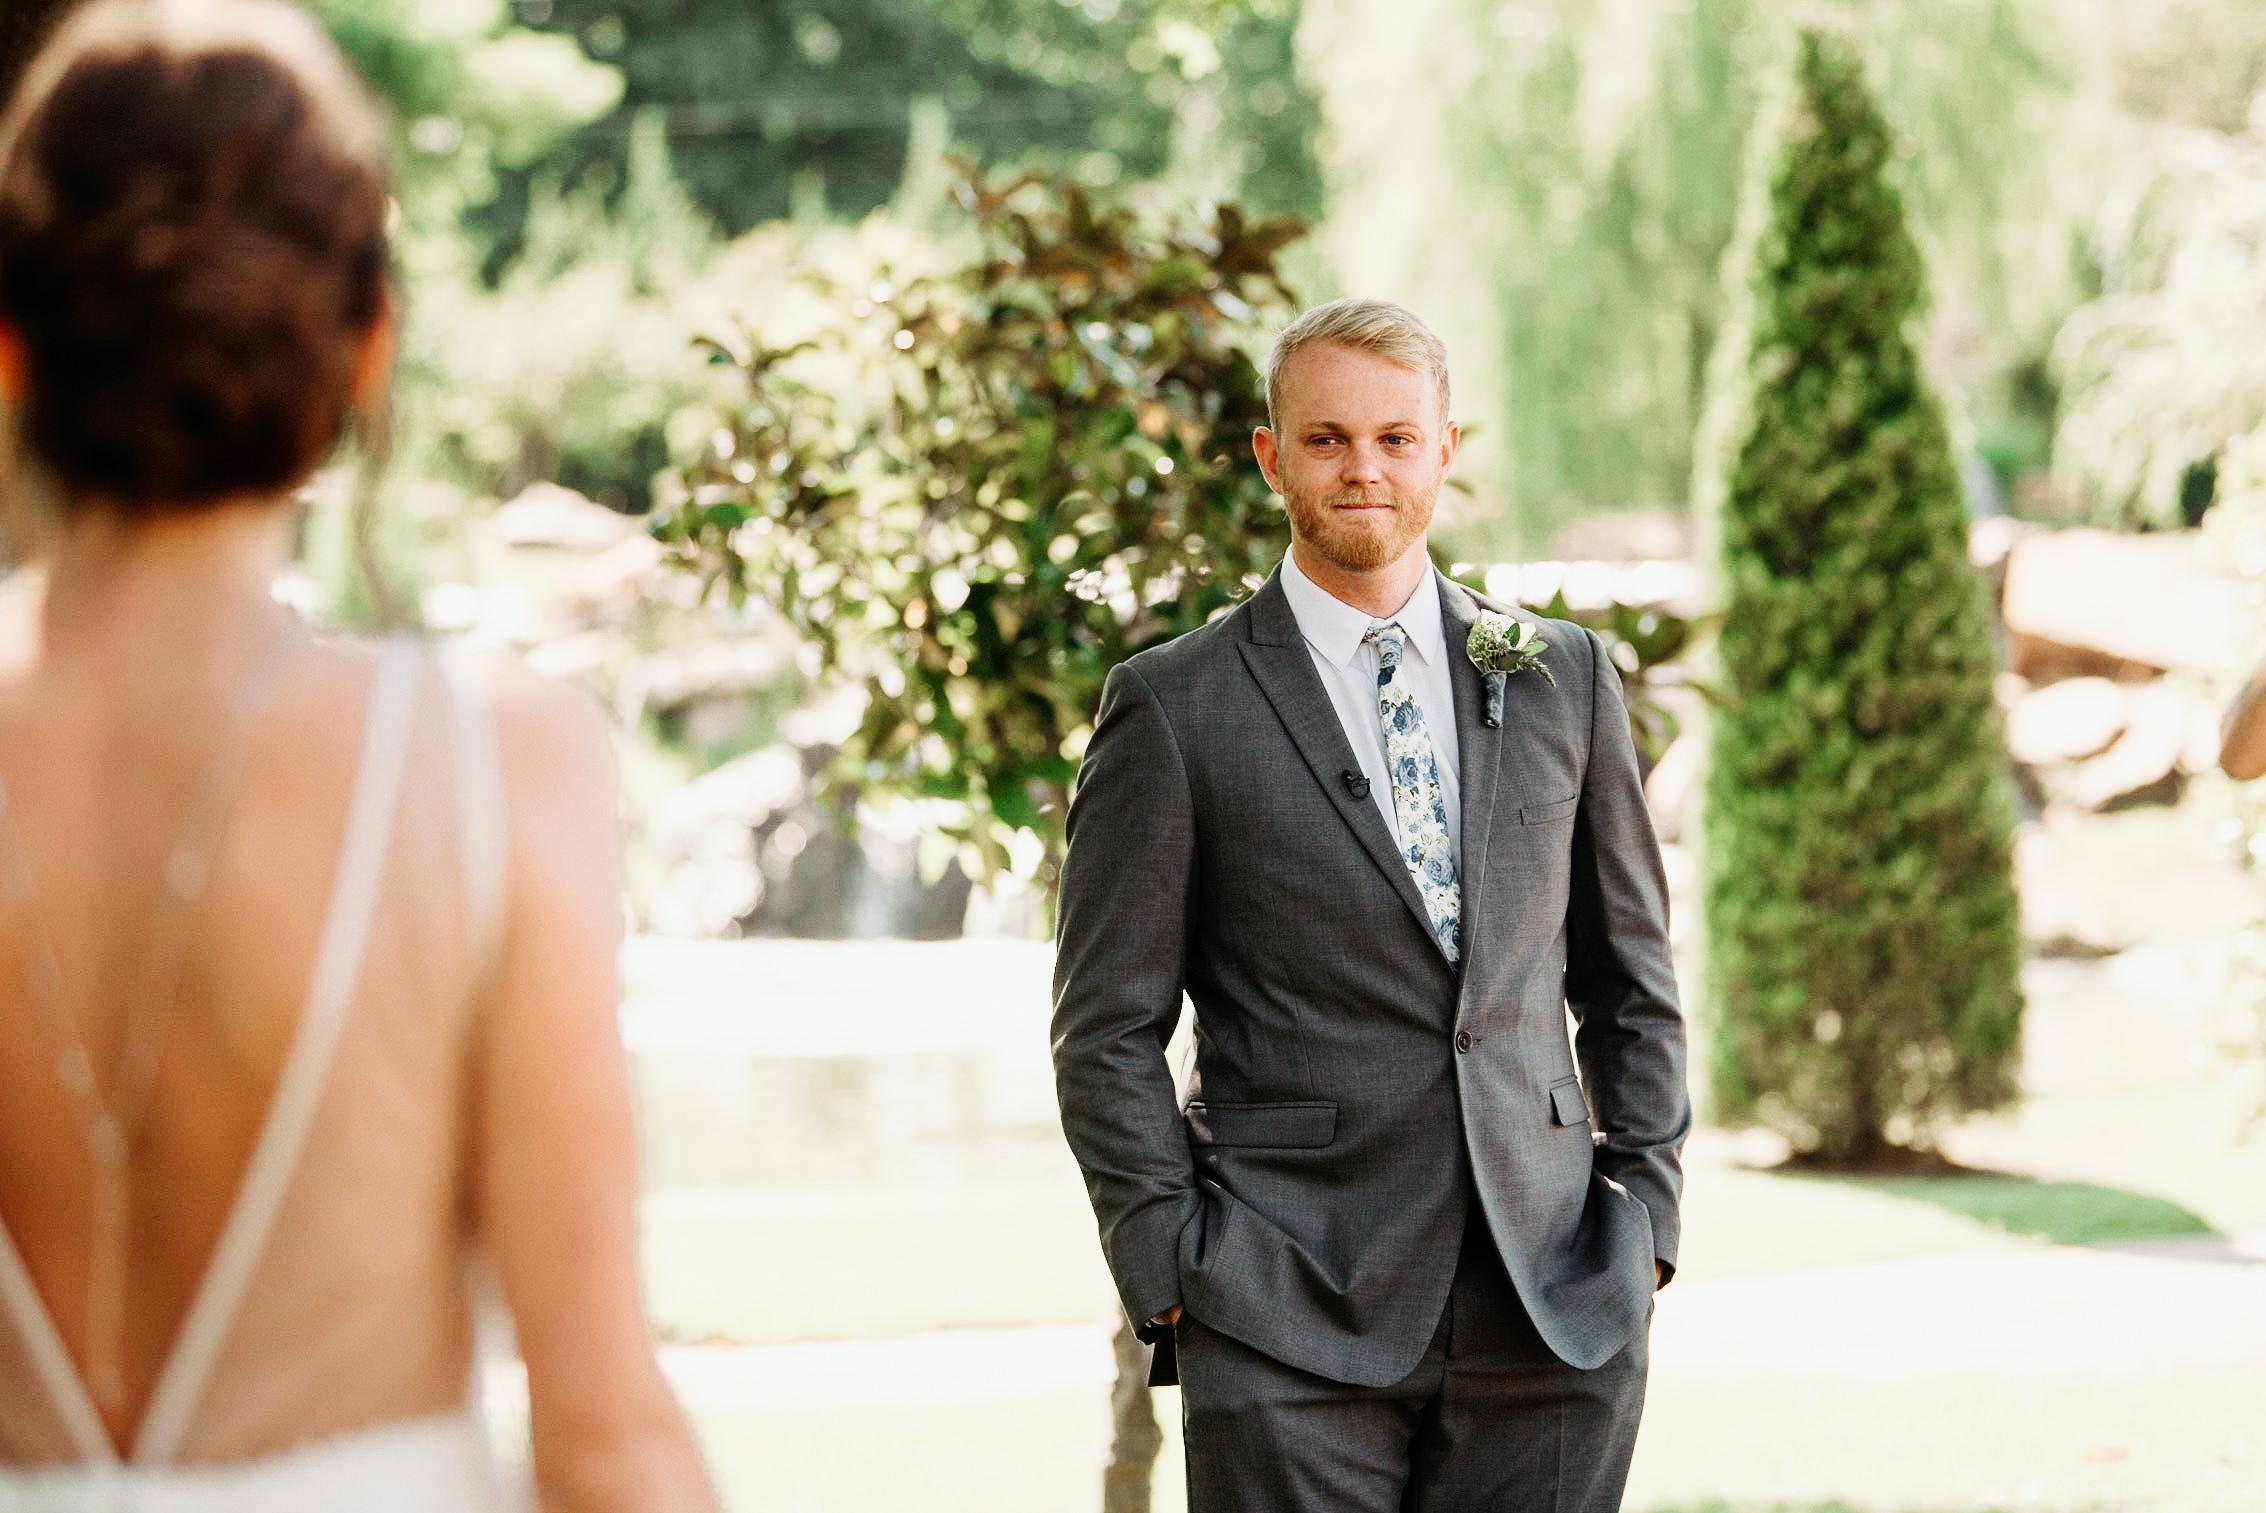 okc-wedding-photographer-coles-garden-wedding-okc-best-wedding-photographers-38.jpg